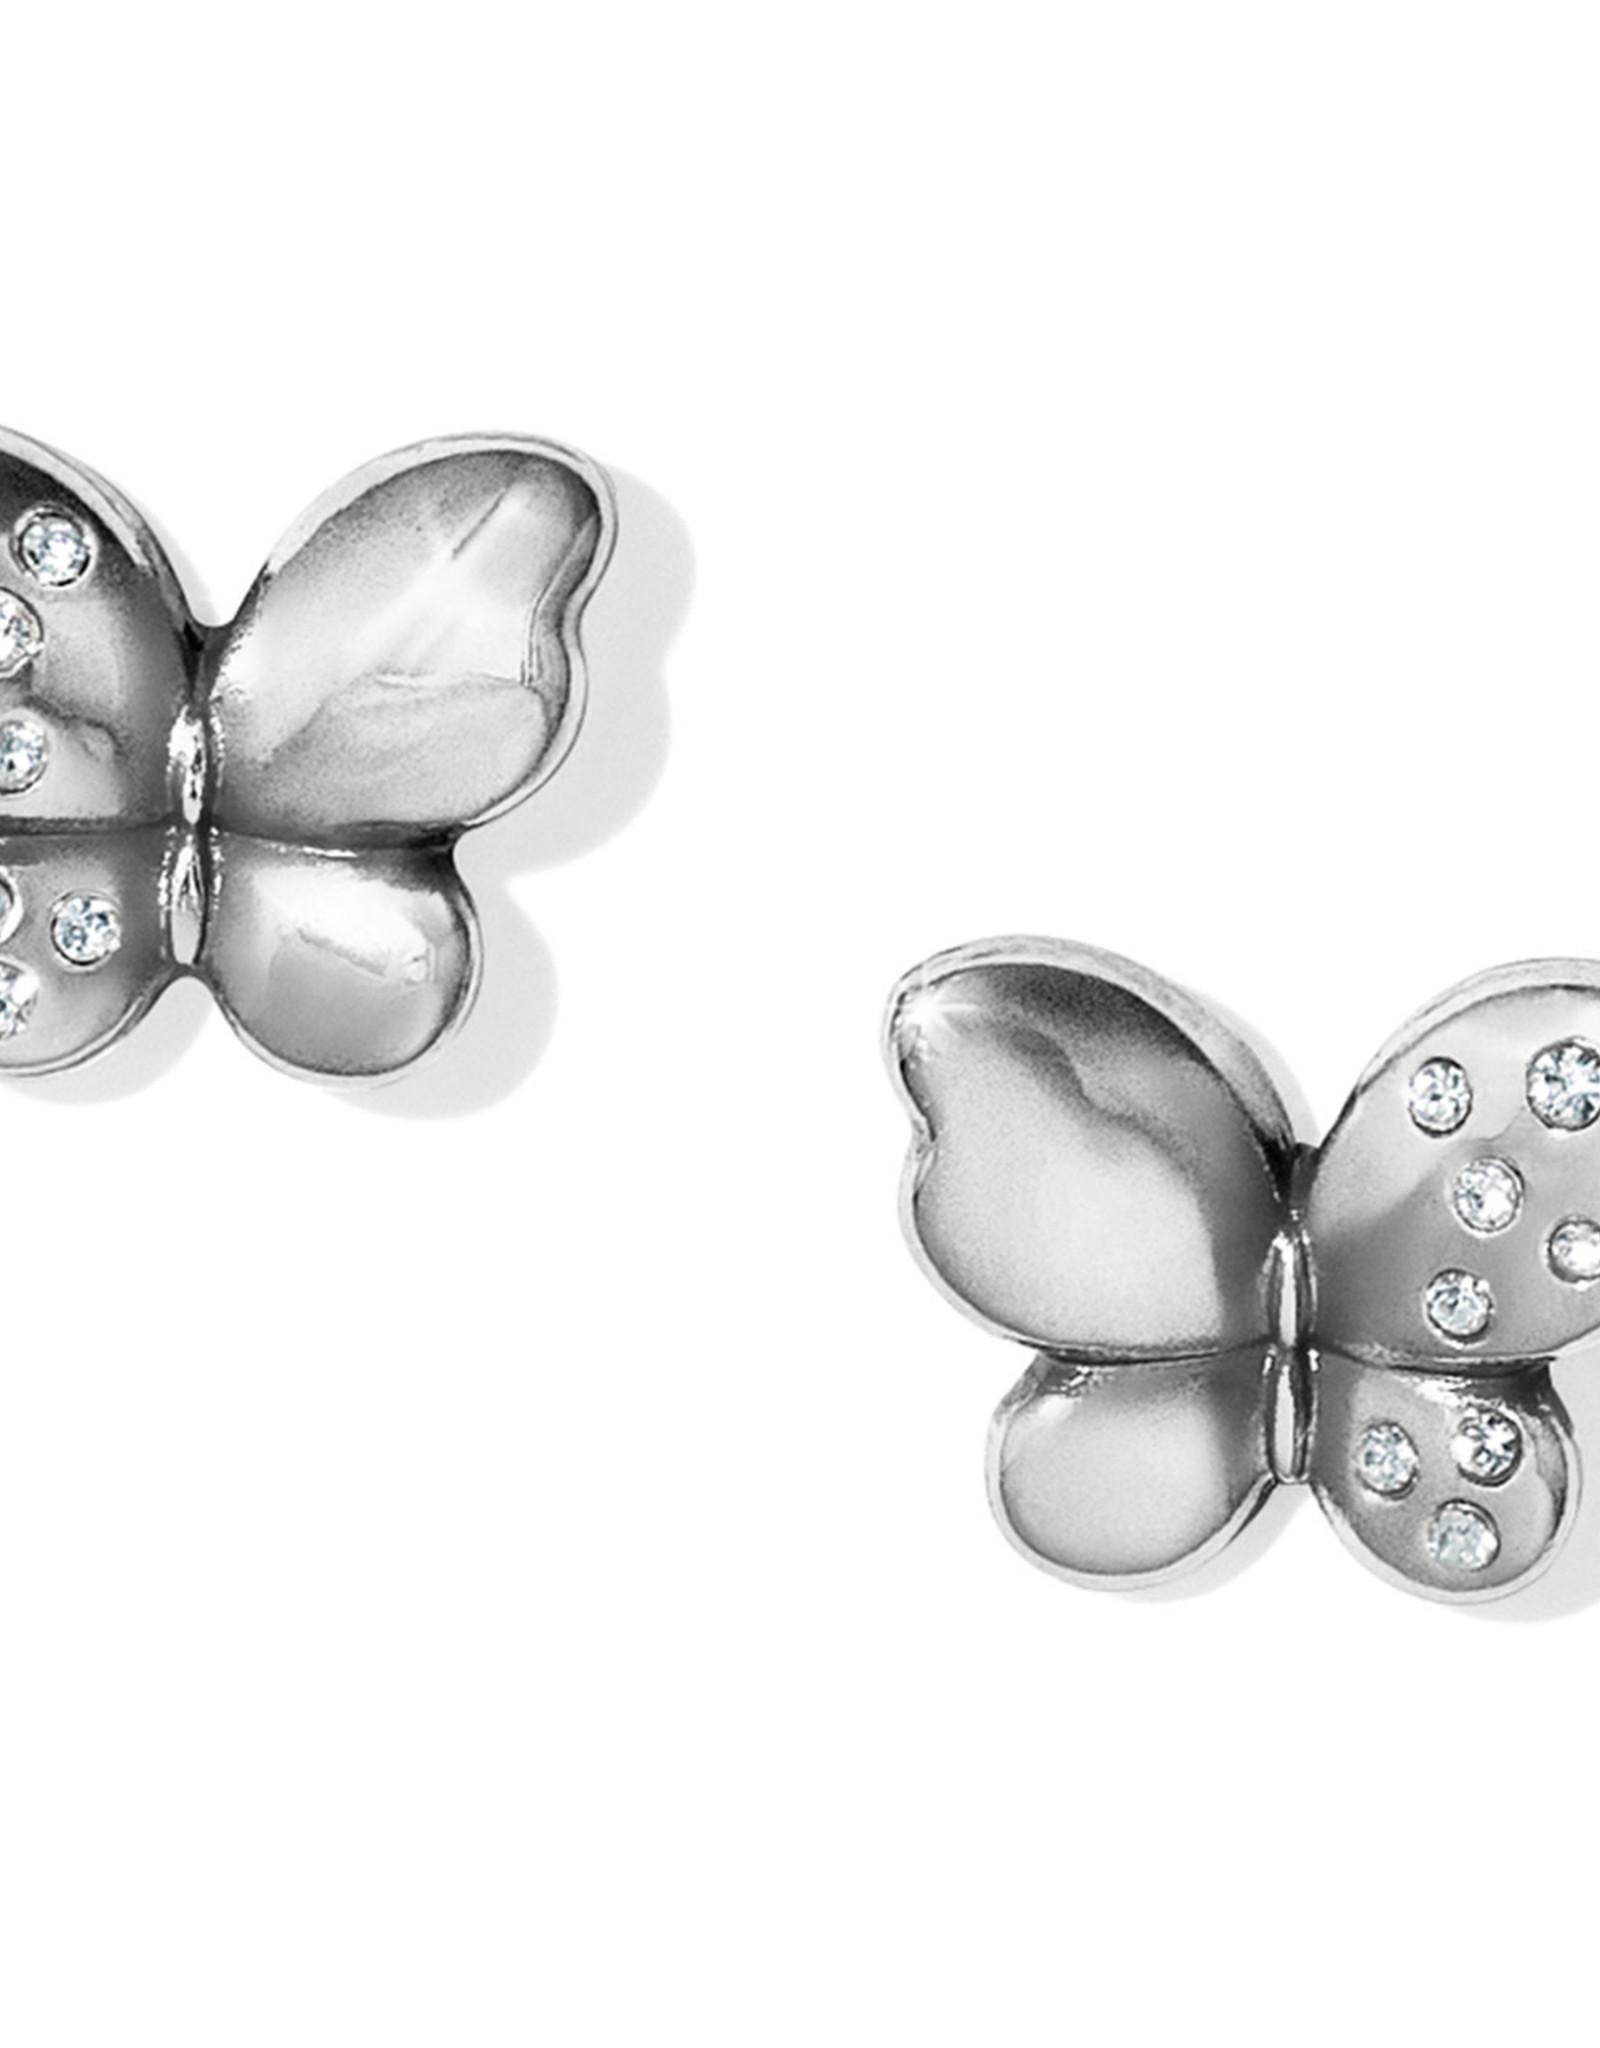 Brighton Brighton, Butterfly Kiss Mini Post Earrings